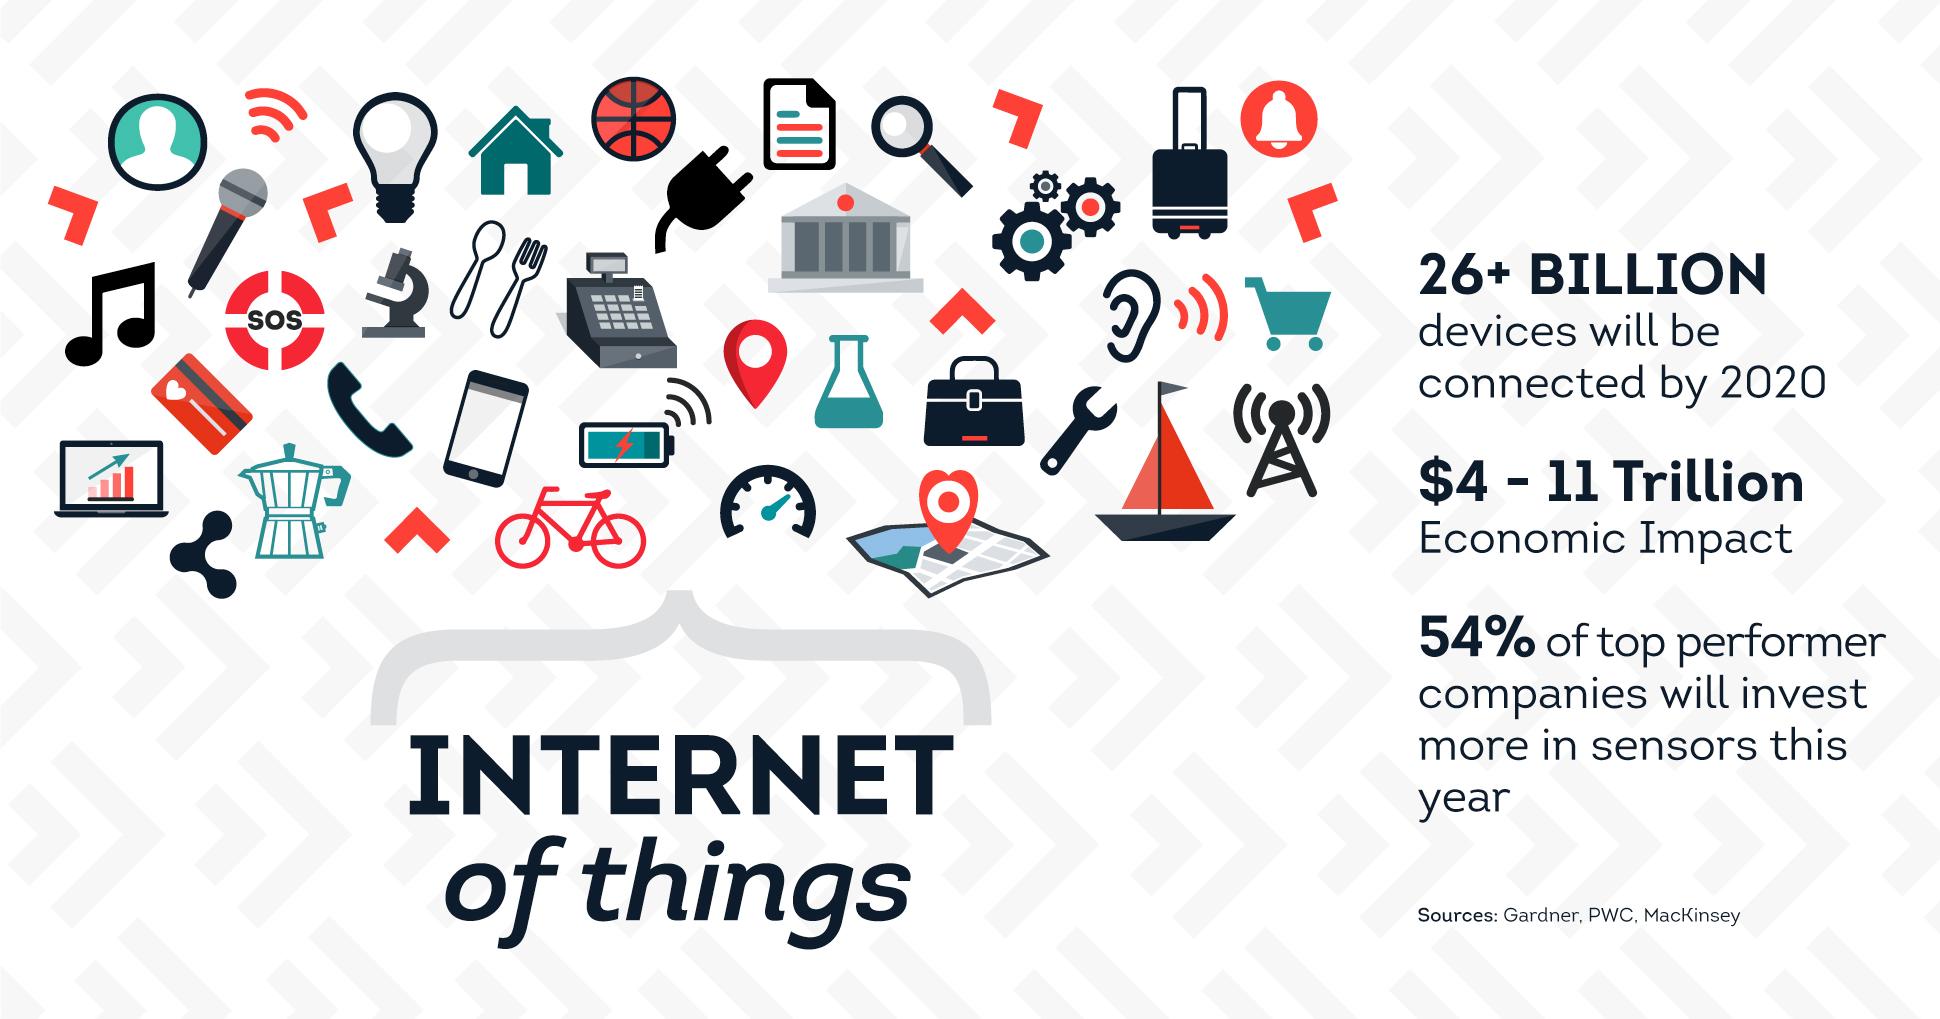 INTERNET-OF-THINGS_1